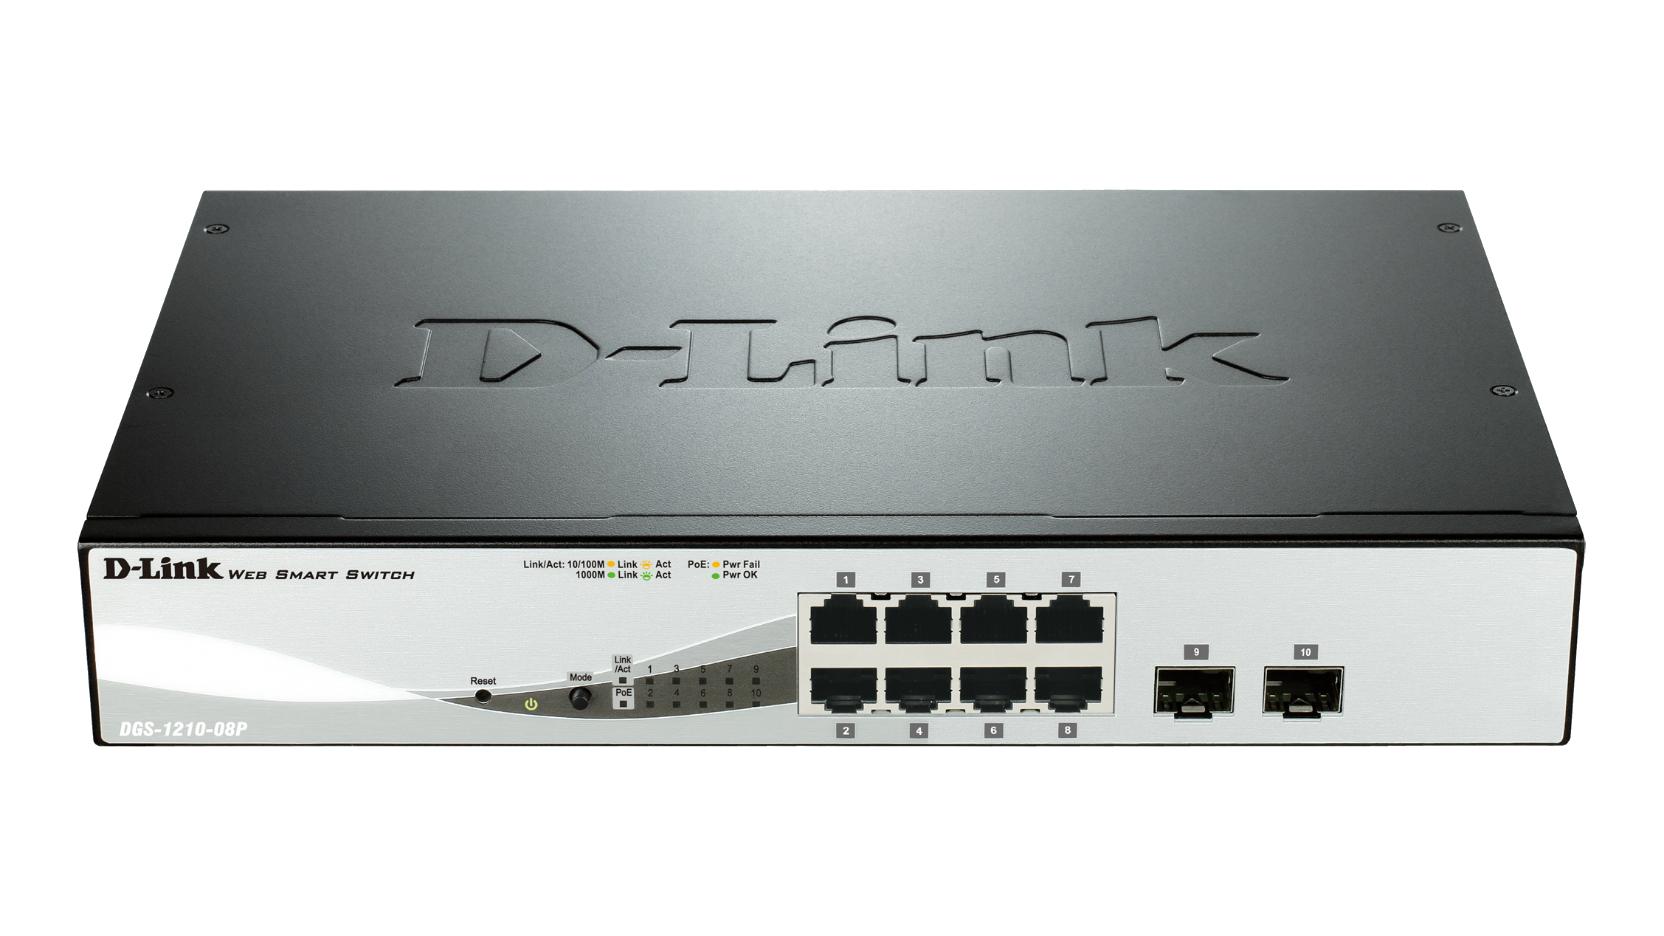 D-Link DGS-1210-08P network switch